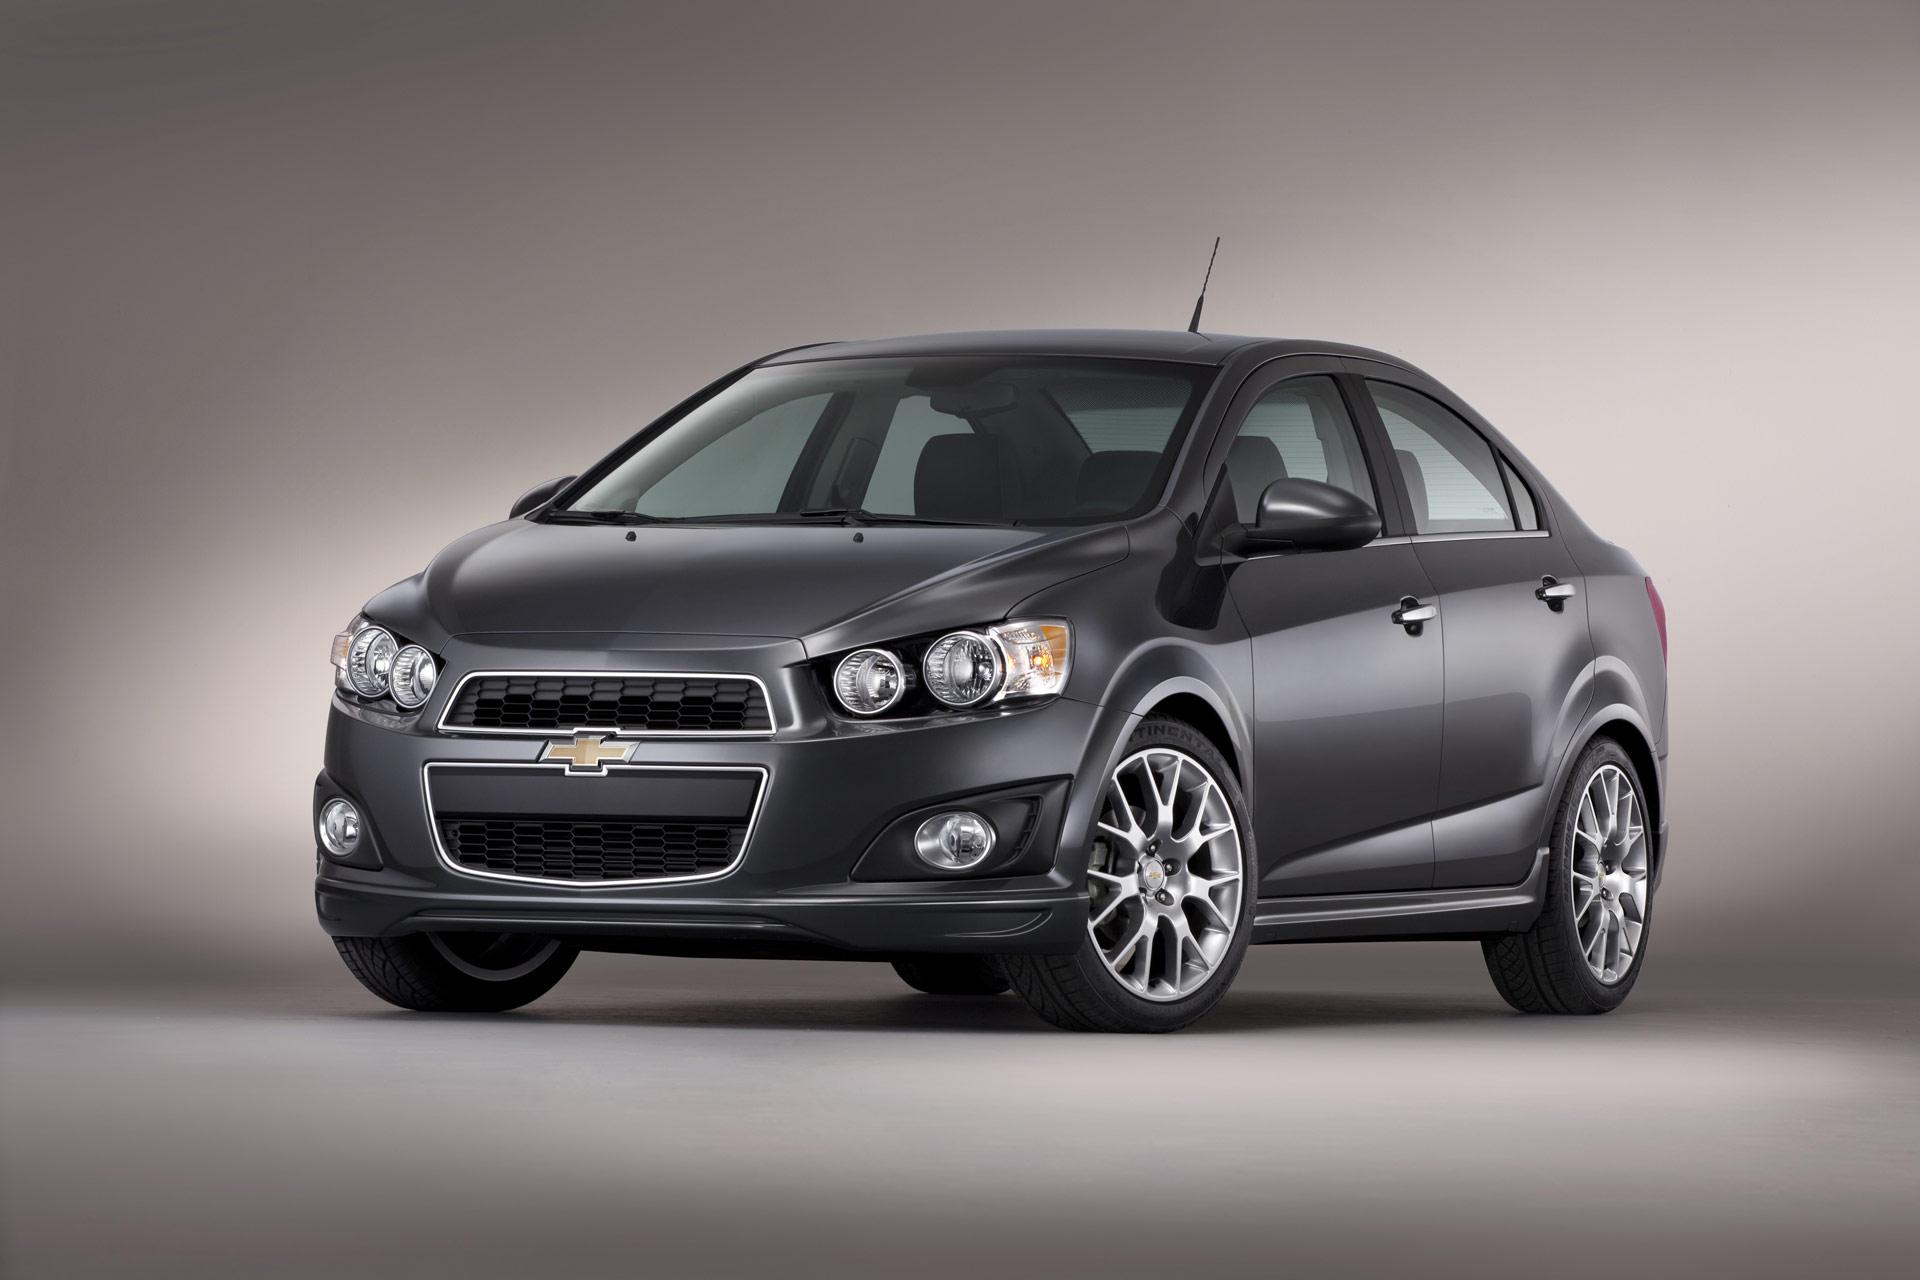 Kelebihan Kekurangan Sonic Chevrolet 2013 Top Model Tahun Ini